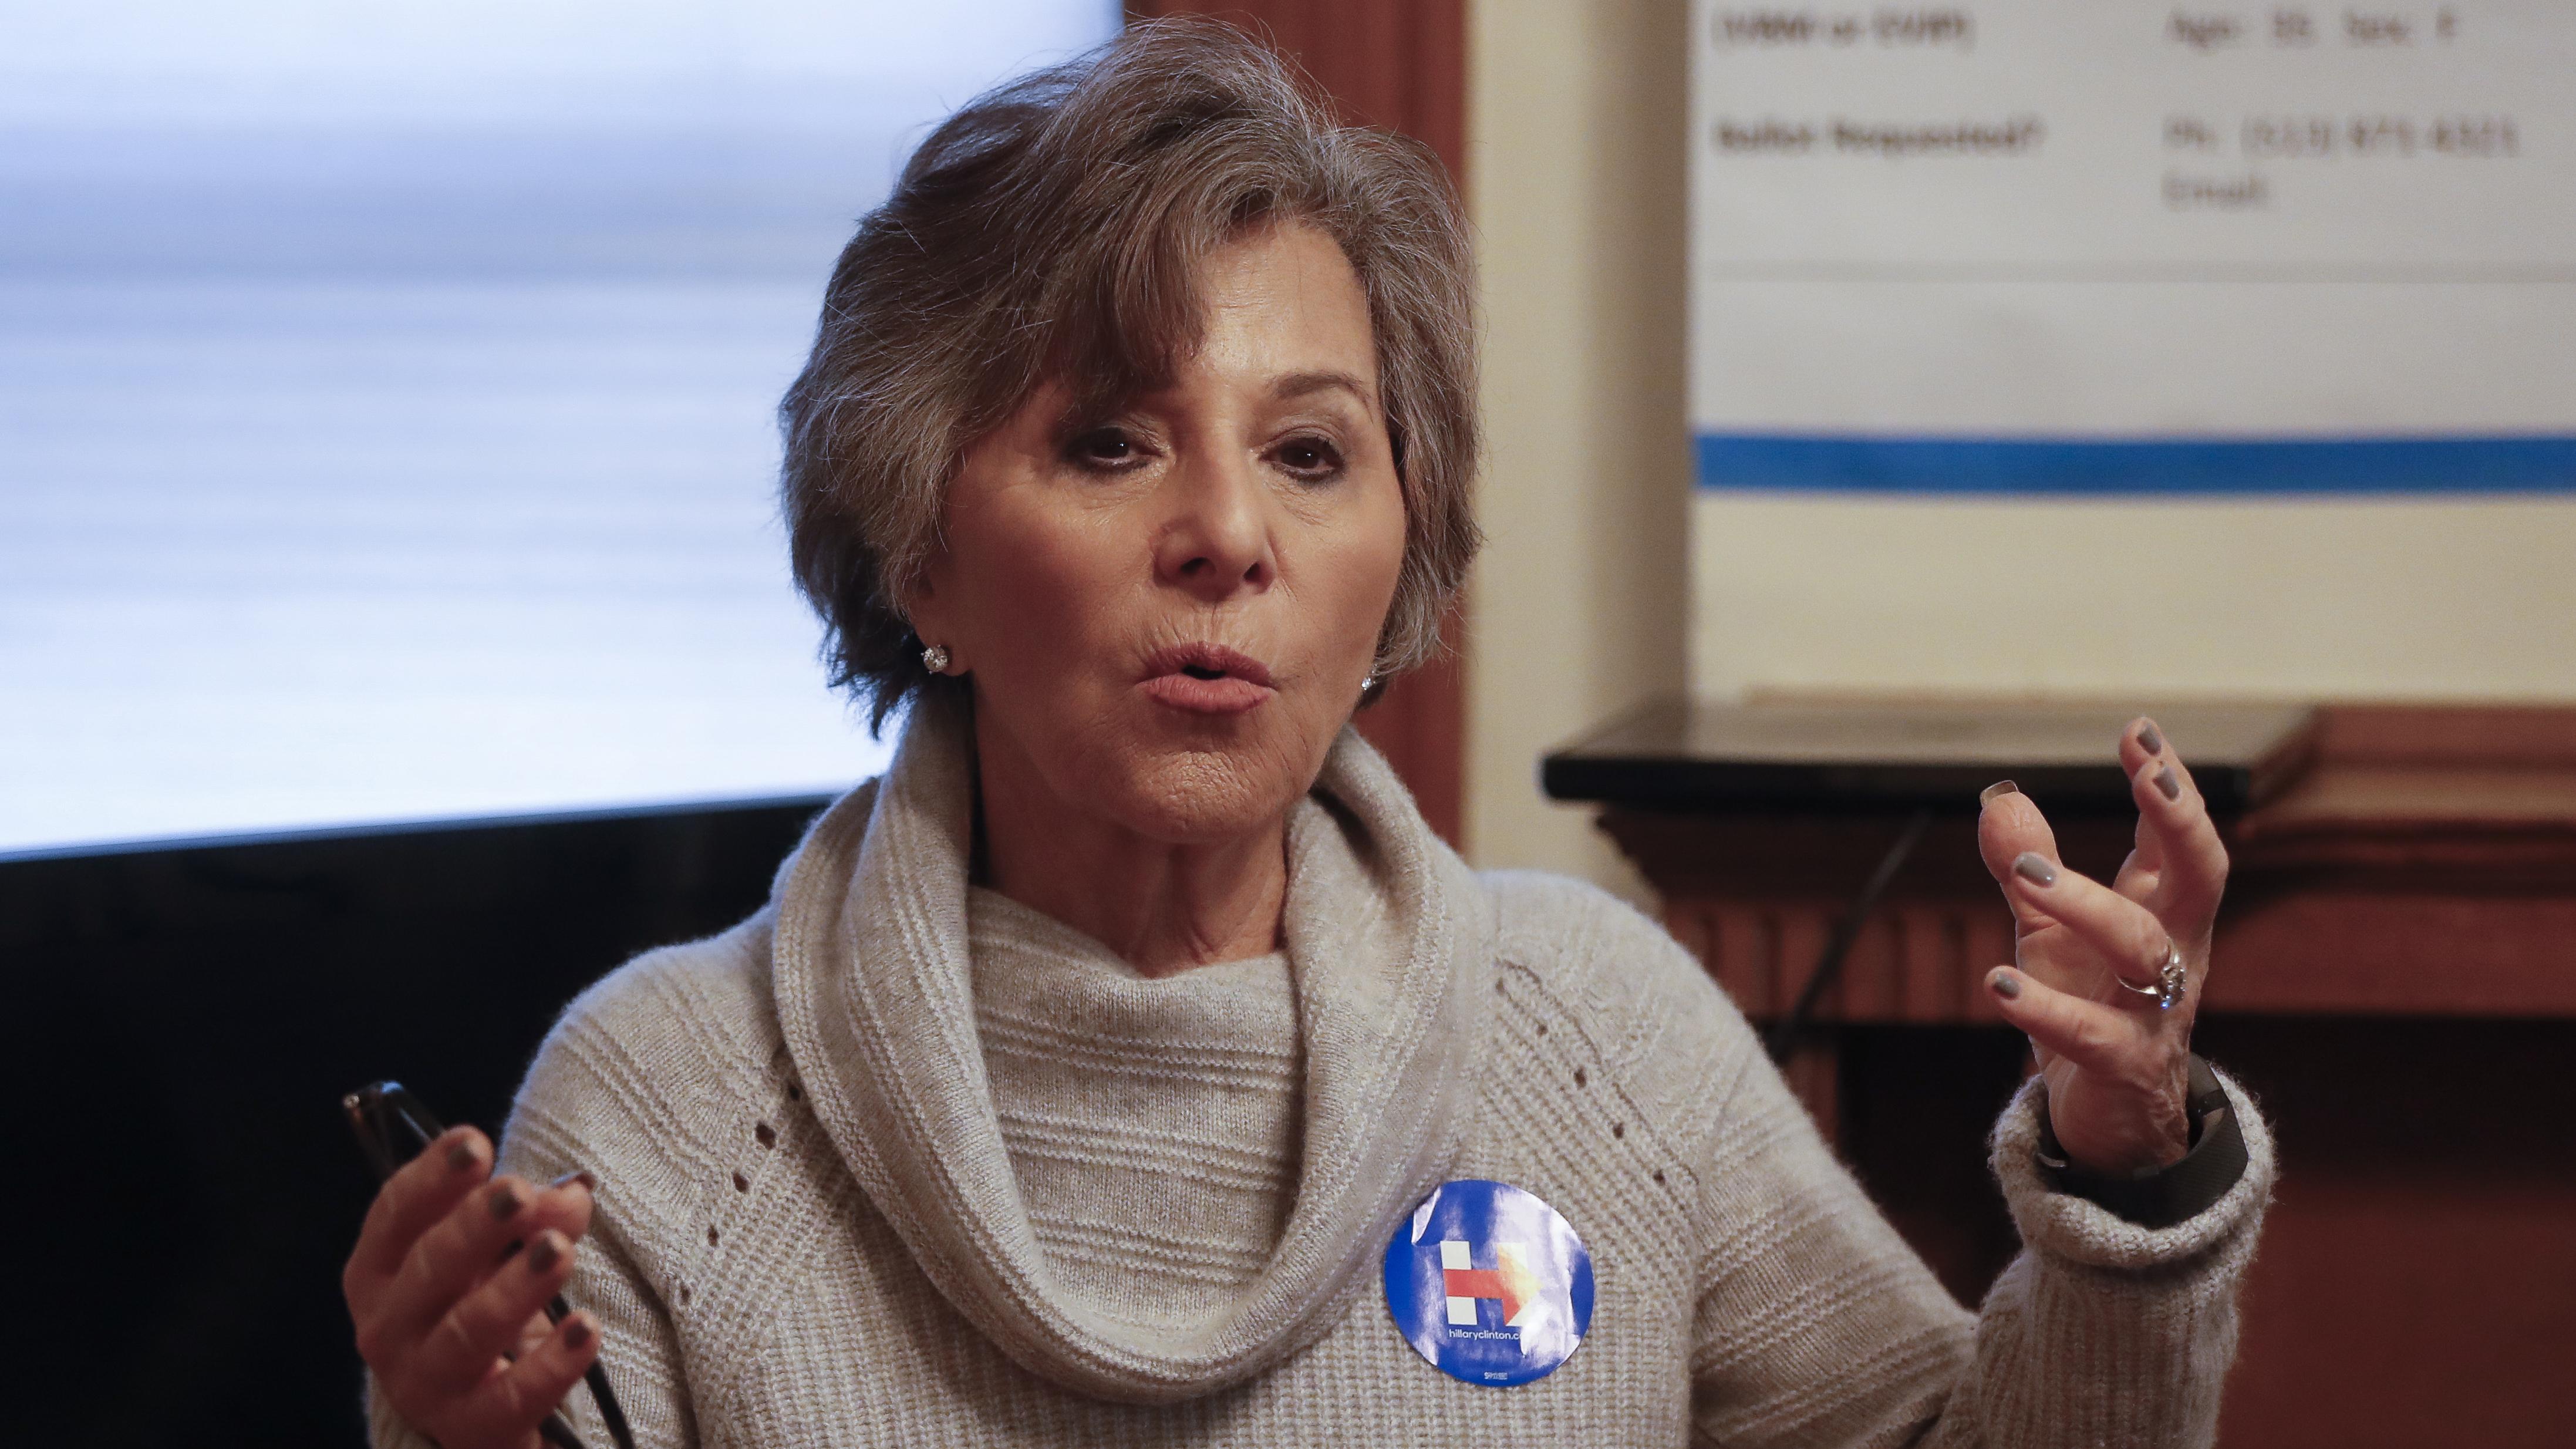 California senator Barbara Boxer